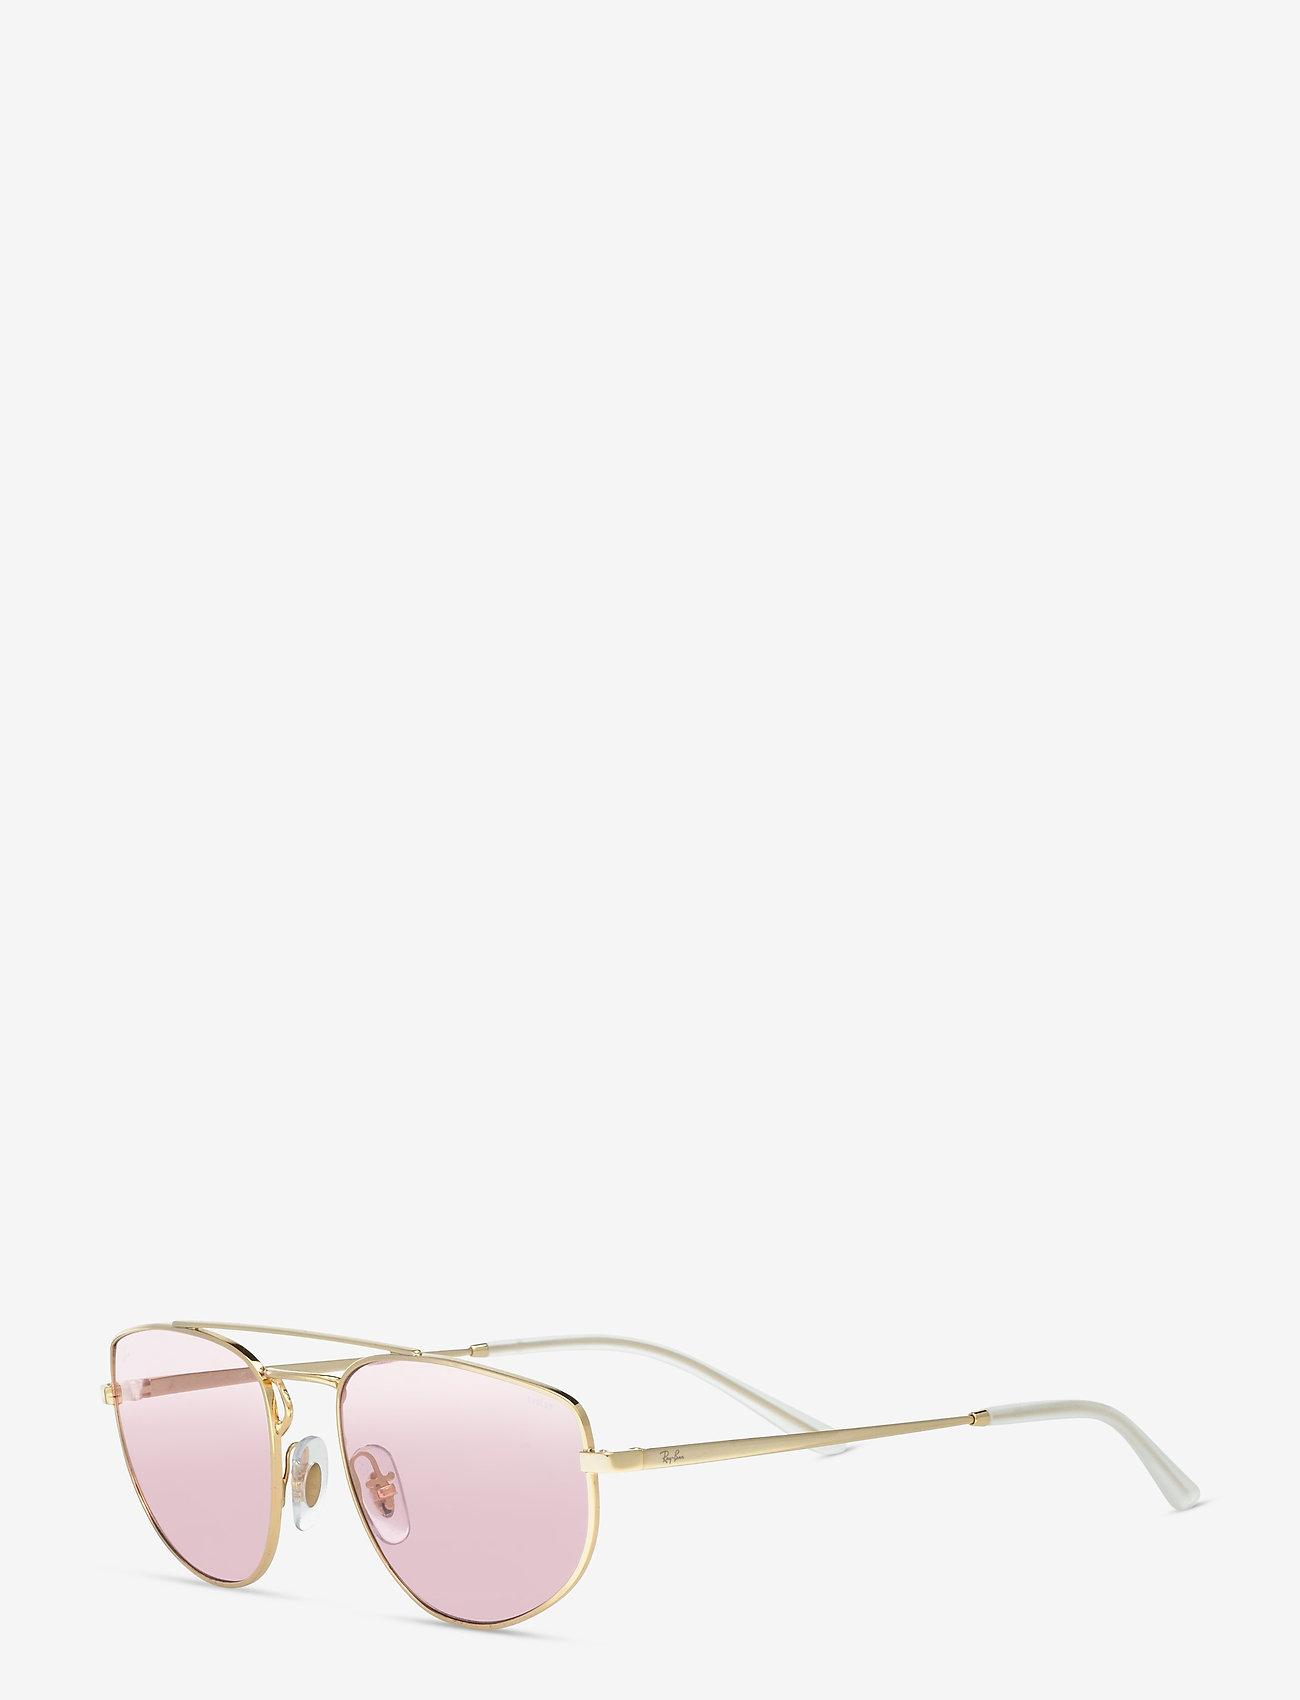 Ray-Ban - Sunglasses - pilot - evolve photo pink to blue - 1